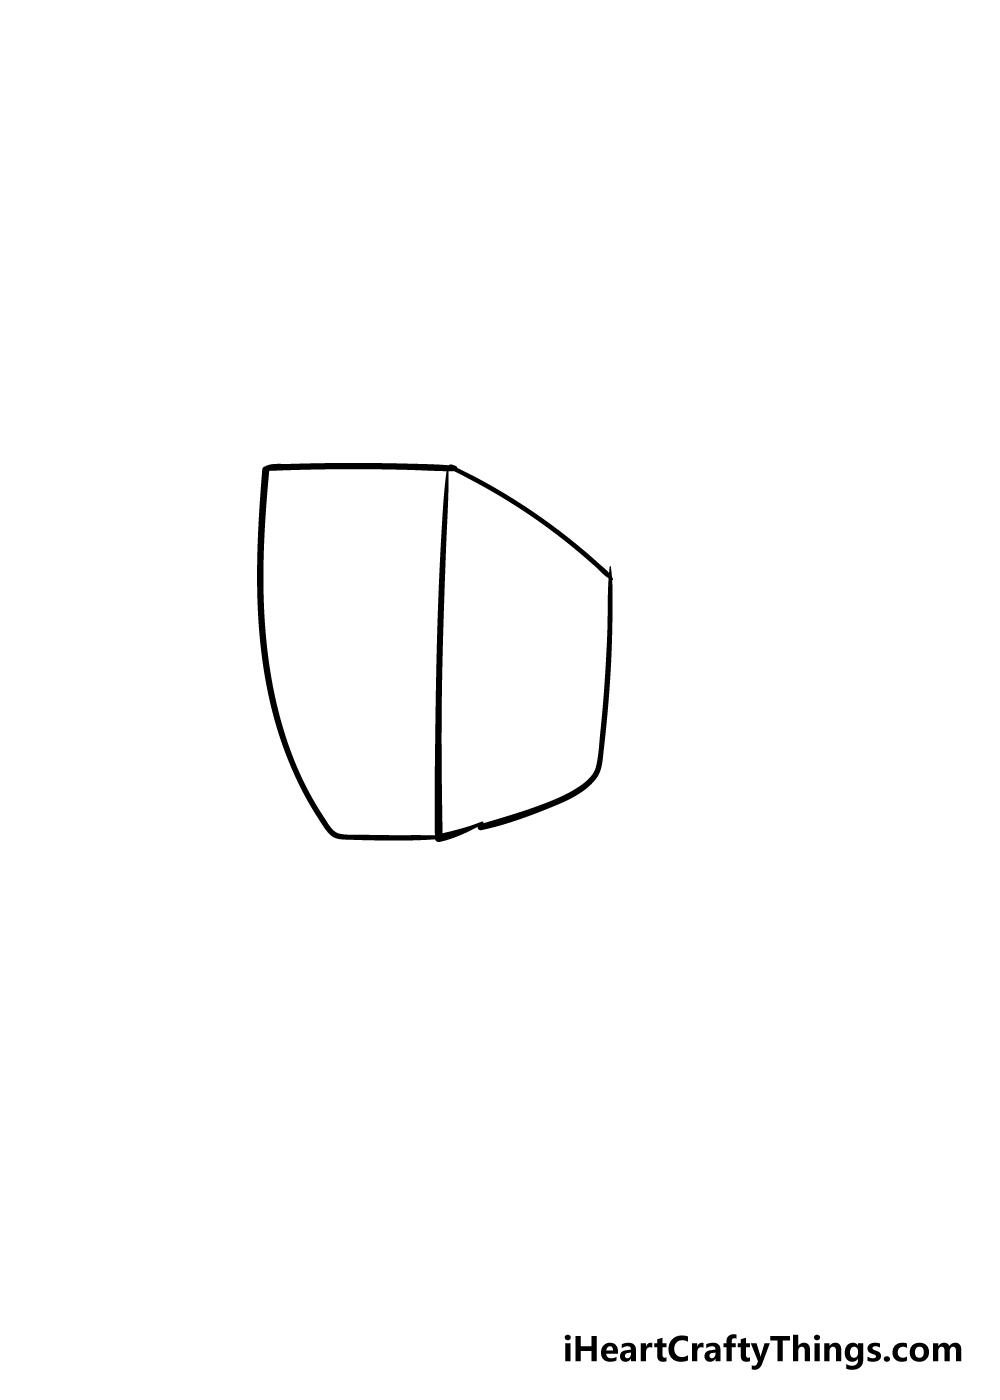 fist drawing step 1